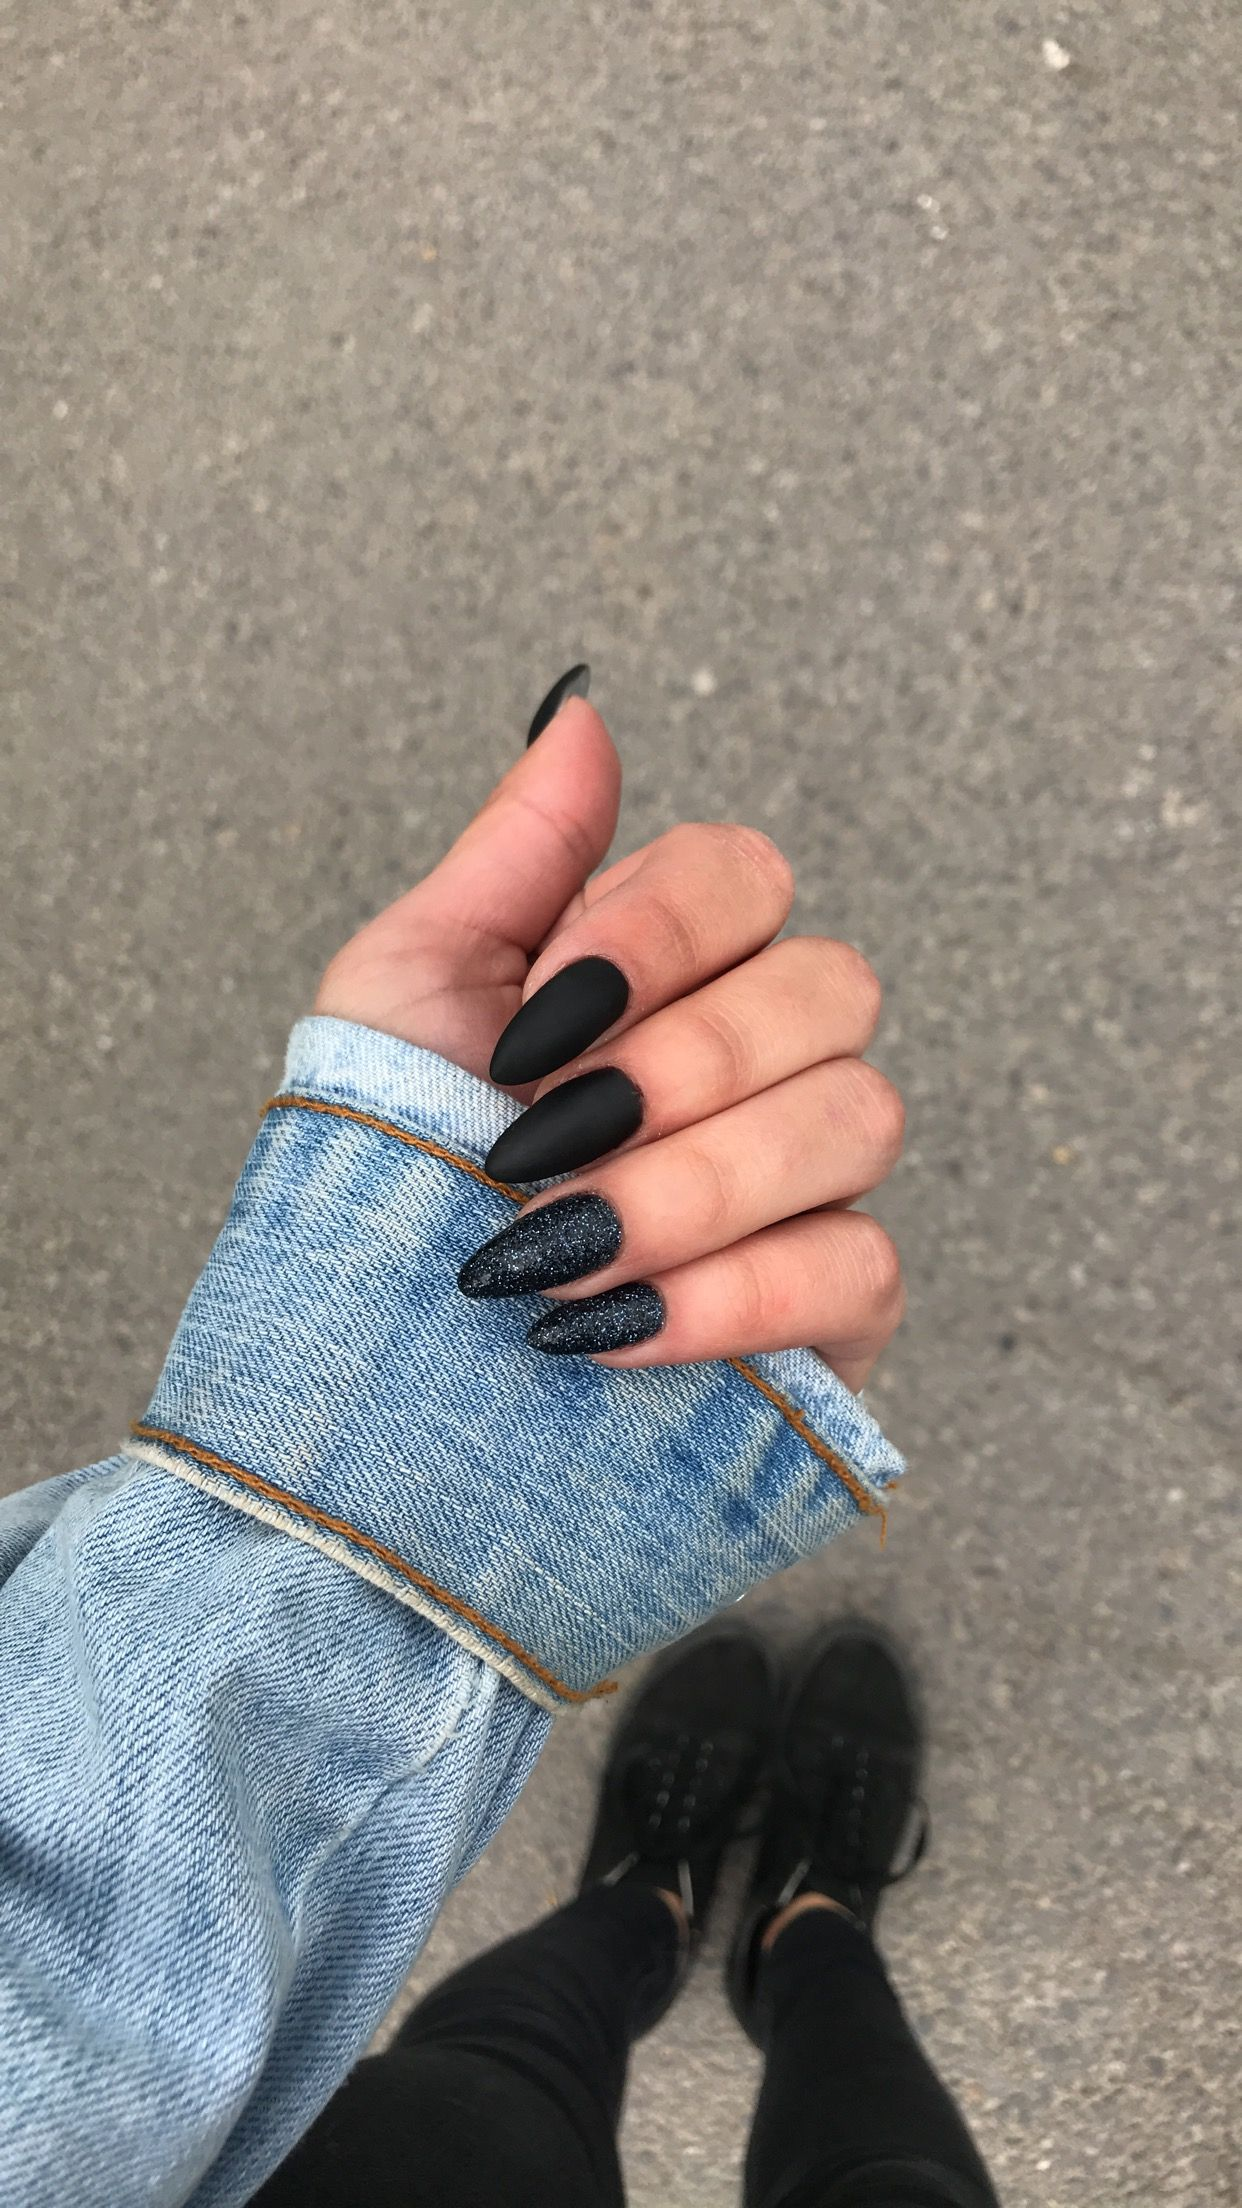 Instagram Oliwciaks Nails Pinterest Paznokcie ładne